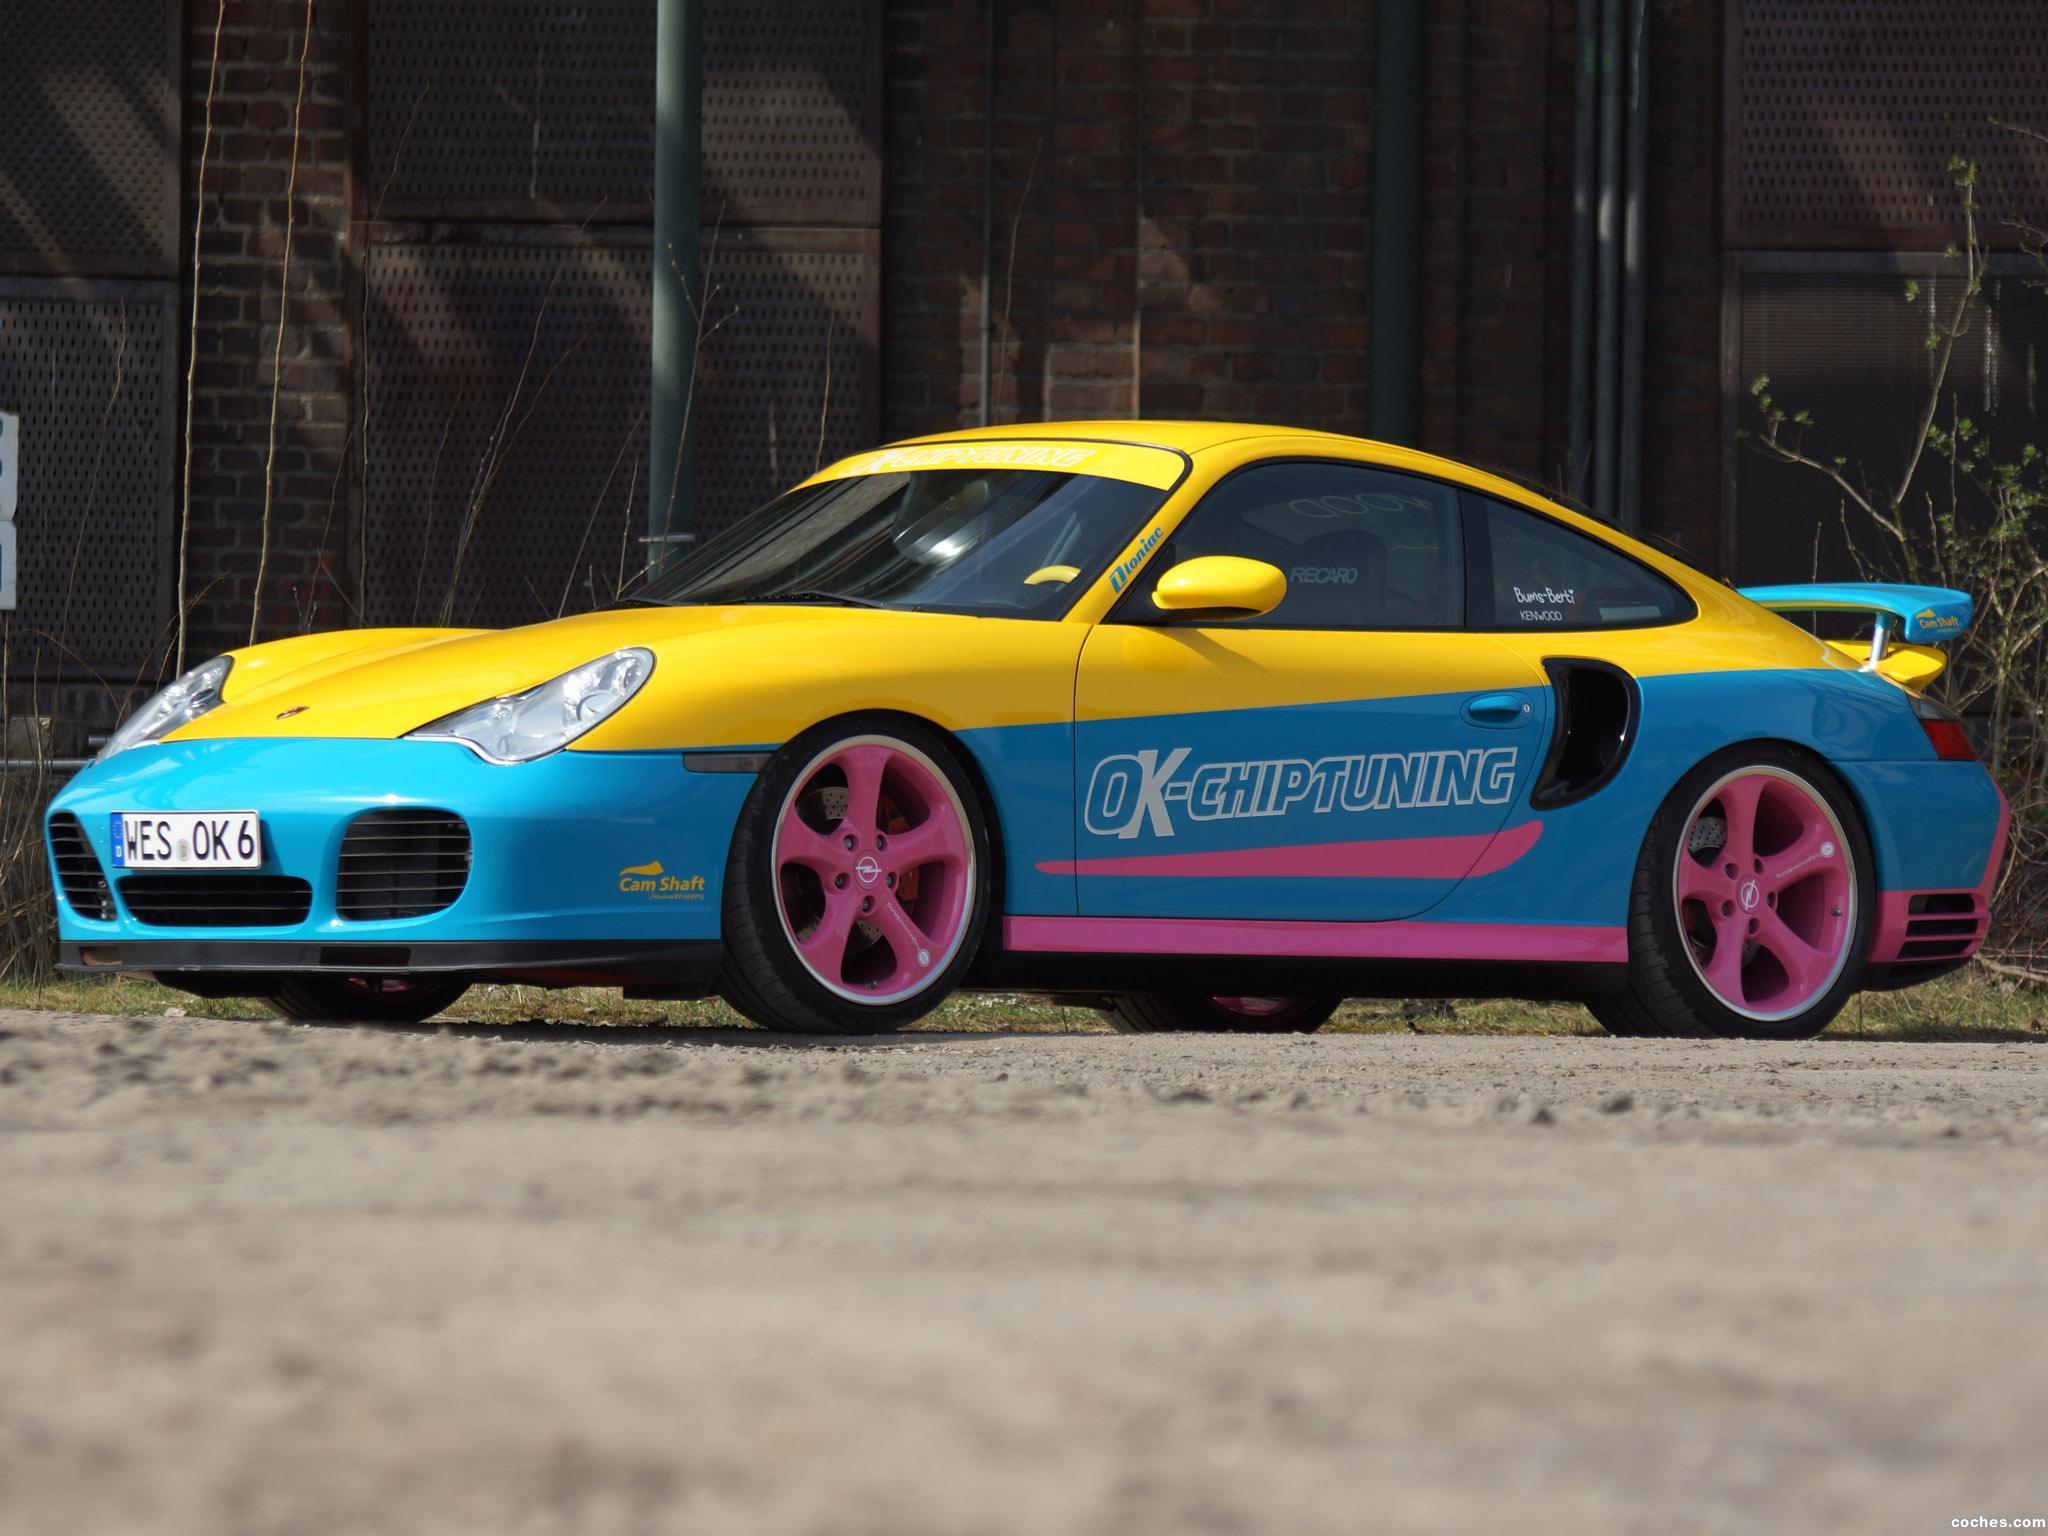 Foto 7 de Cam Shaft Porsche 911 Turbo Ok Chiptuning Manta Tuning 2013